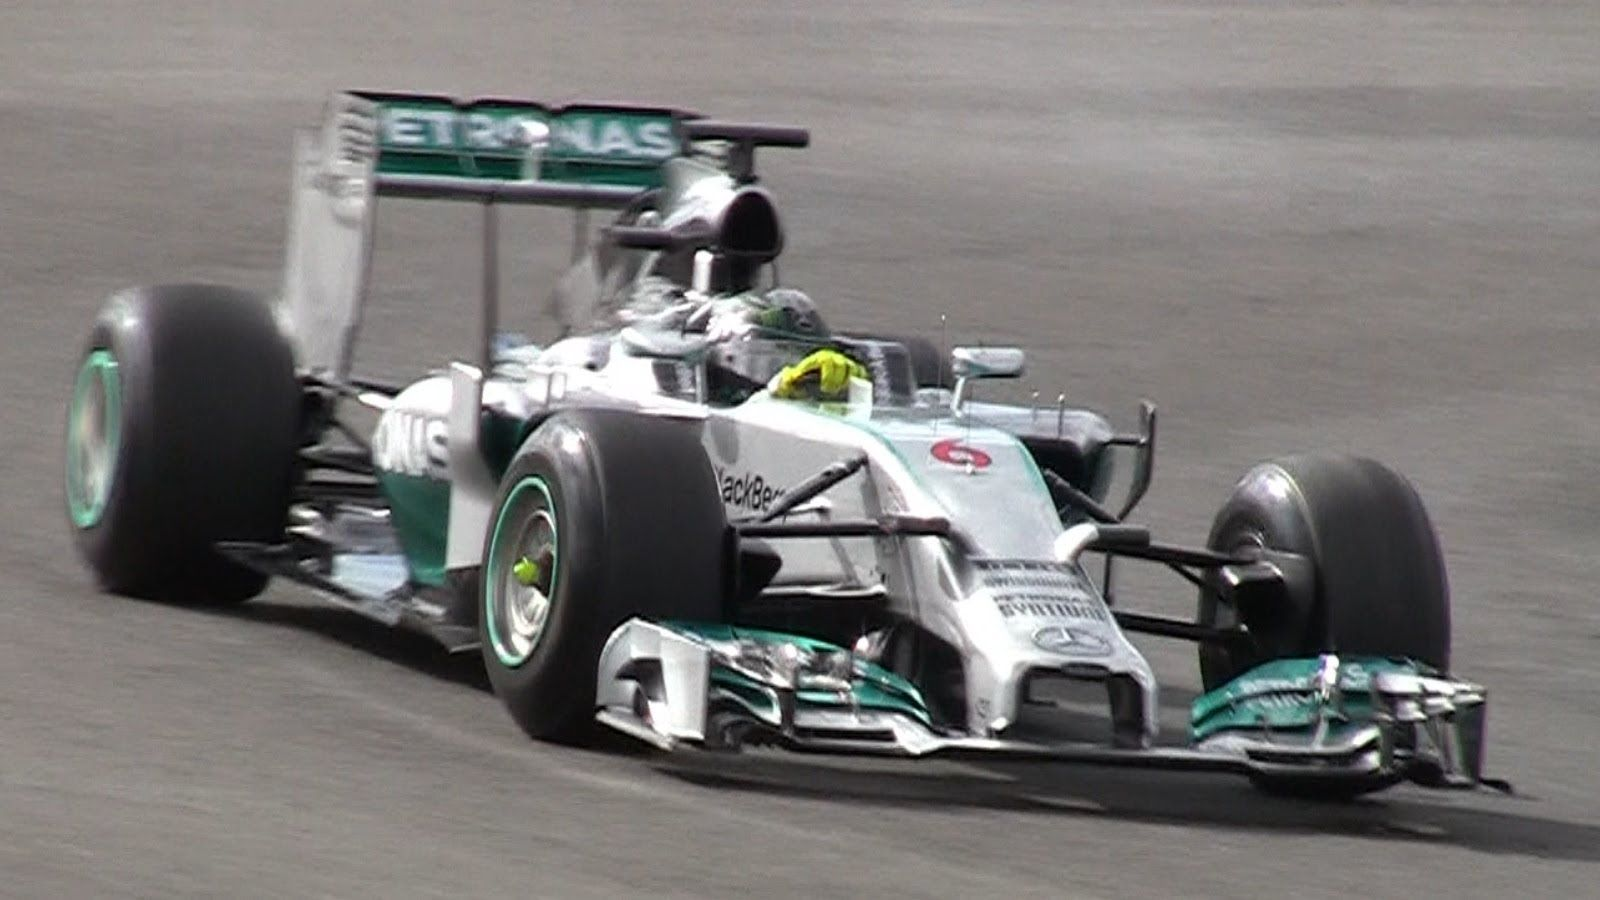 Formula 1 testing 2014 Jerez [HD] pure V6 turbo sound